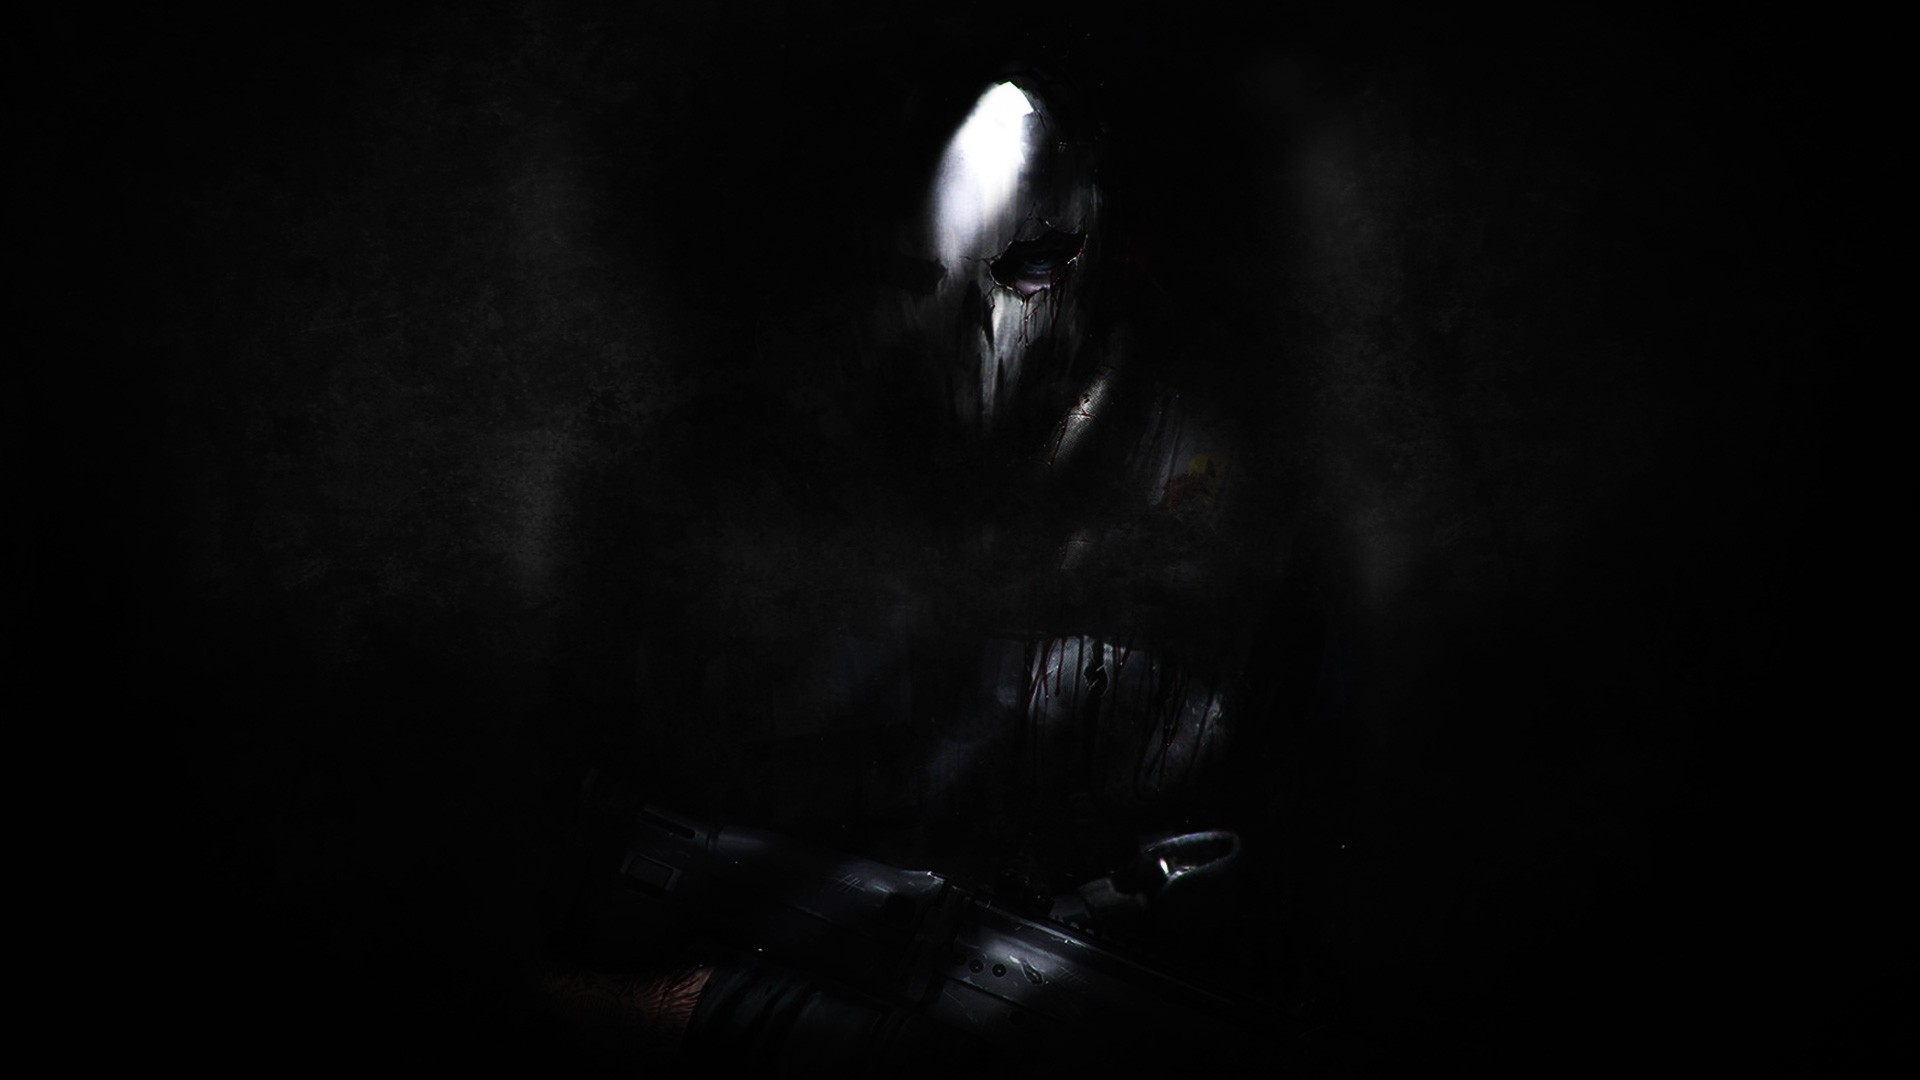 Ghost wallpaper download free beautiful full hd - Call of duty ghost wallpaper hd iphone 5 ...